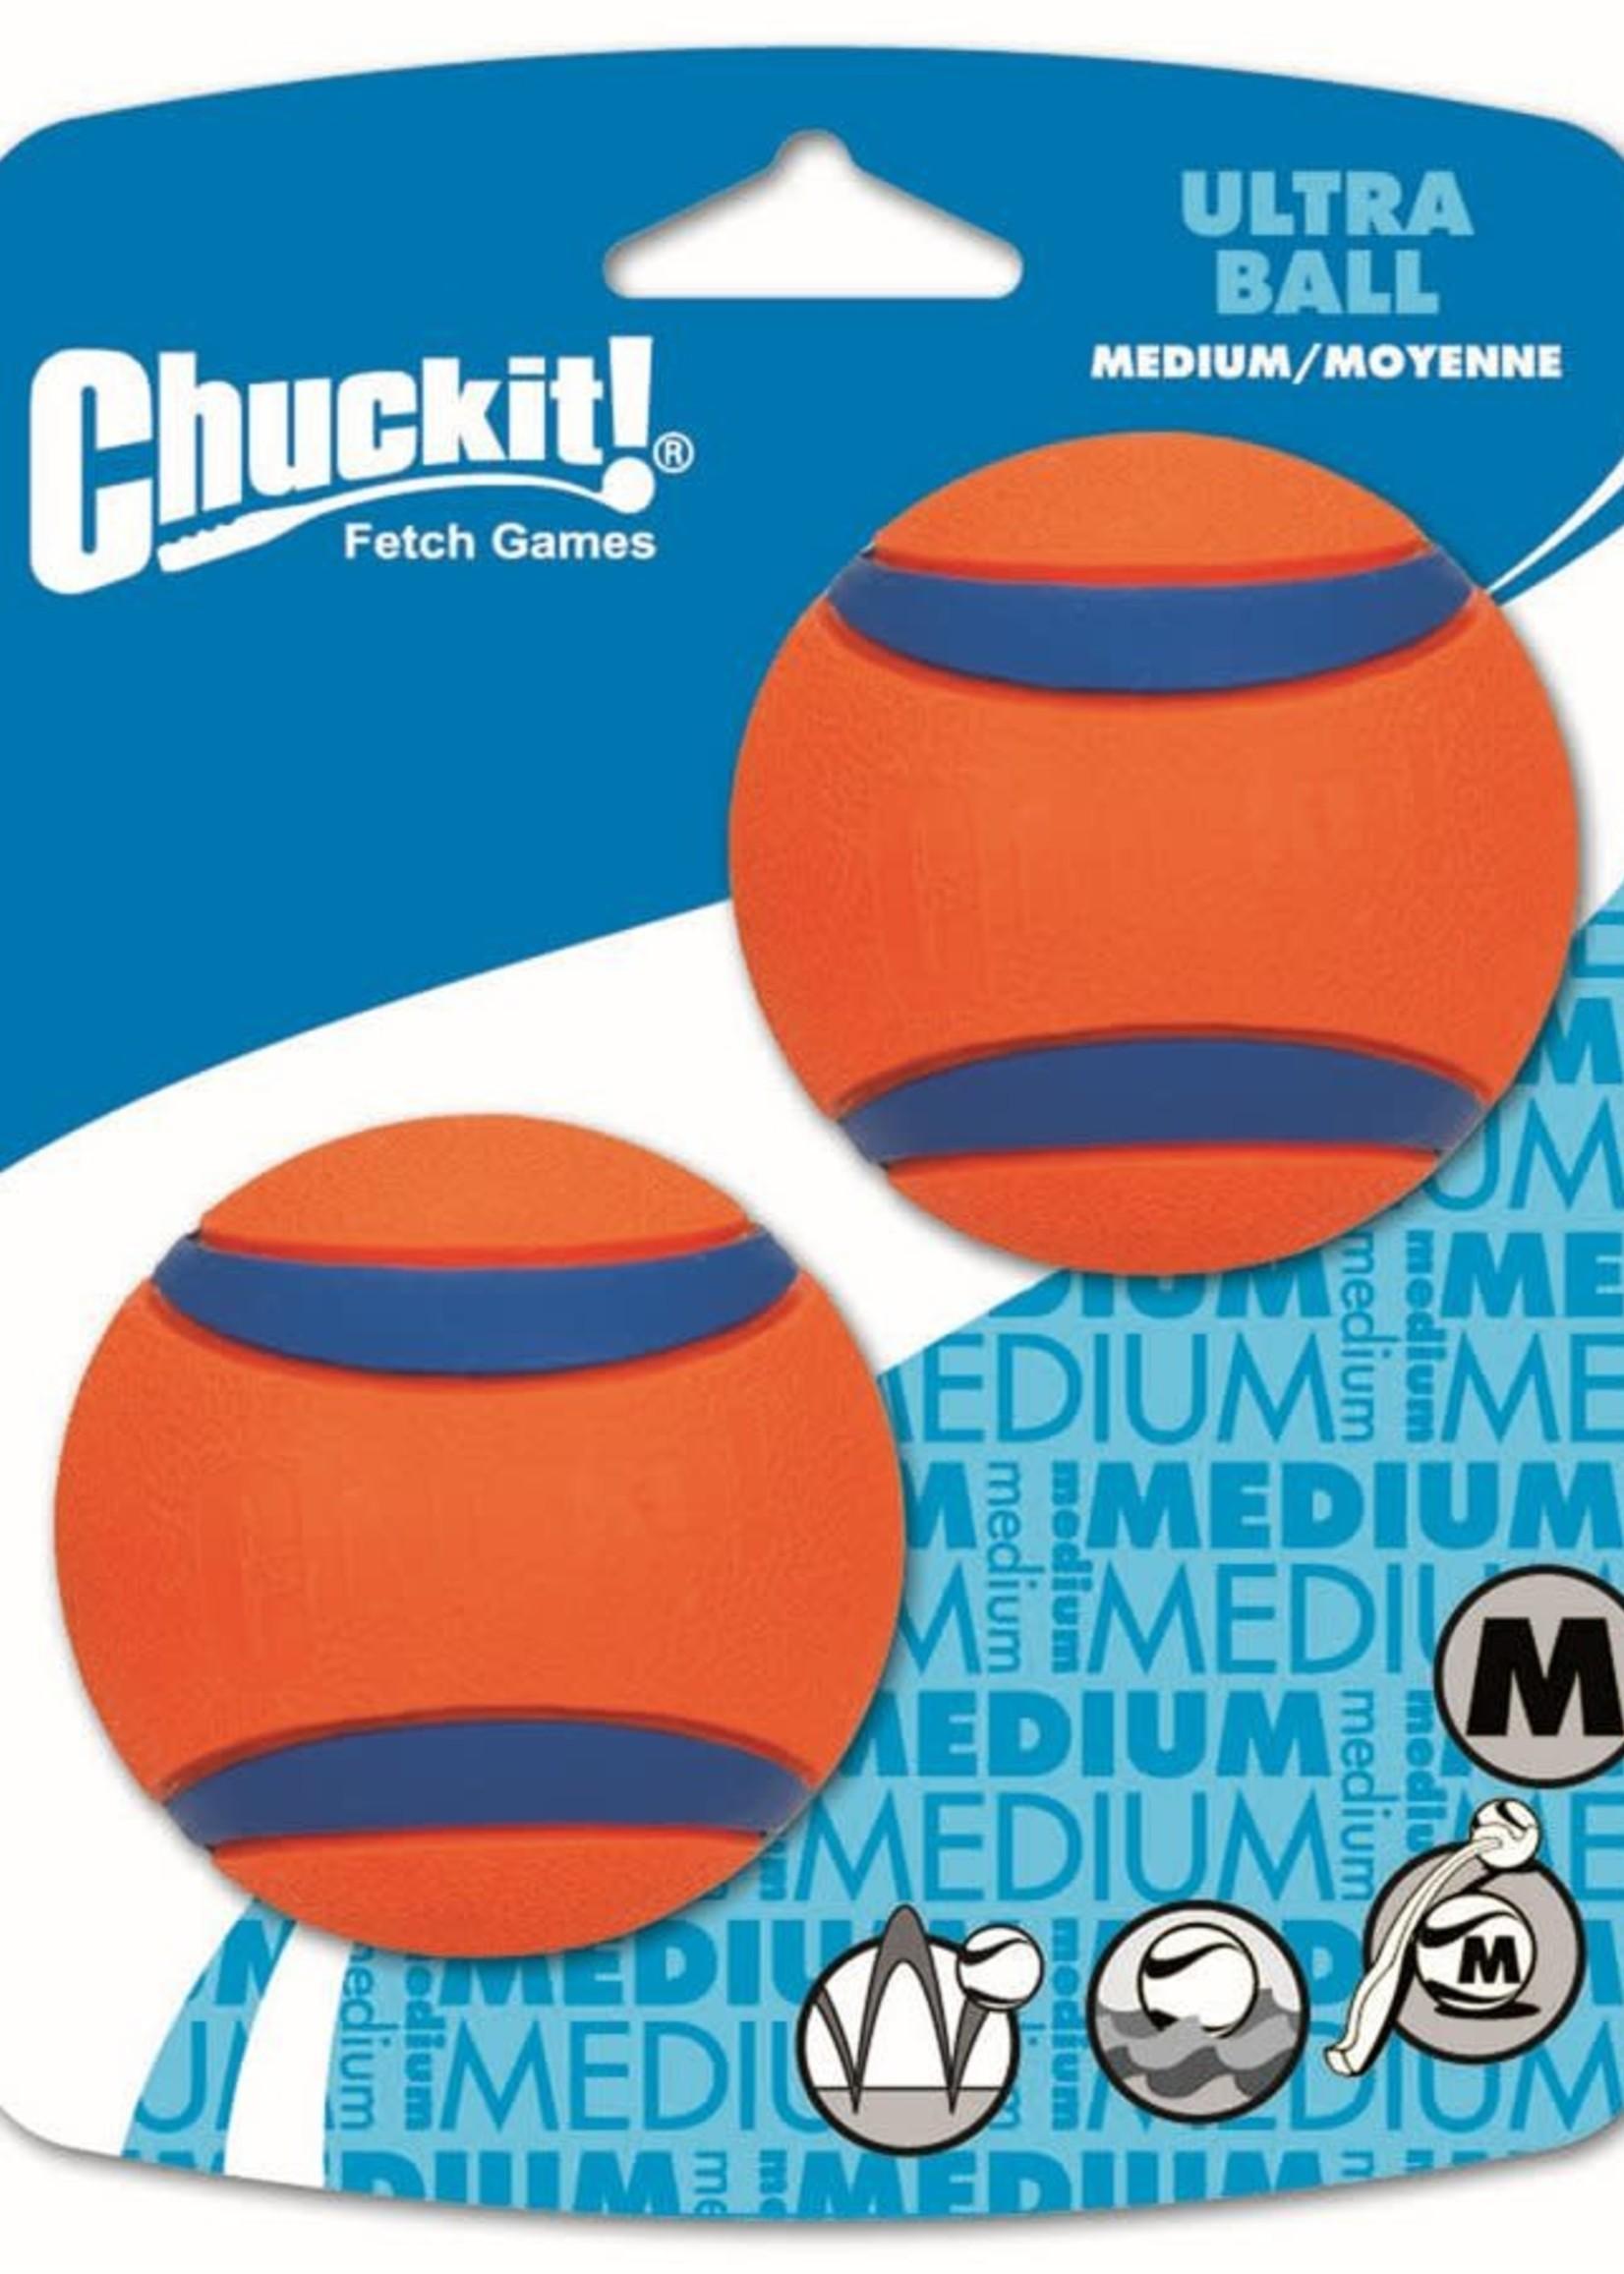 Chuckit!® Chuckit! Ultra Ball 2pk Medium